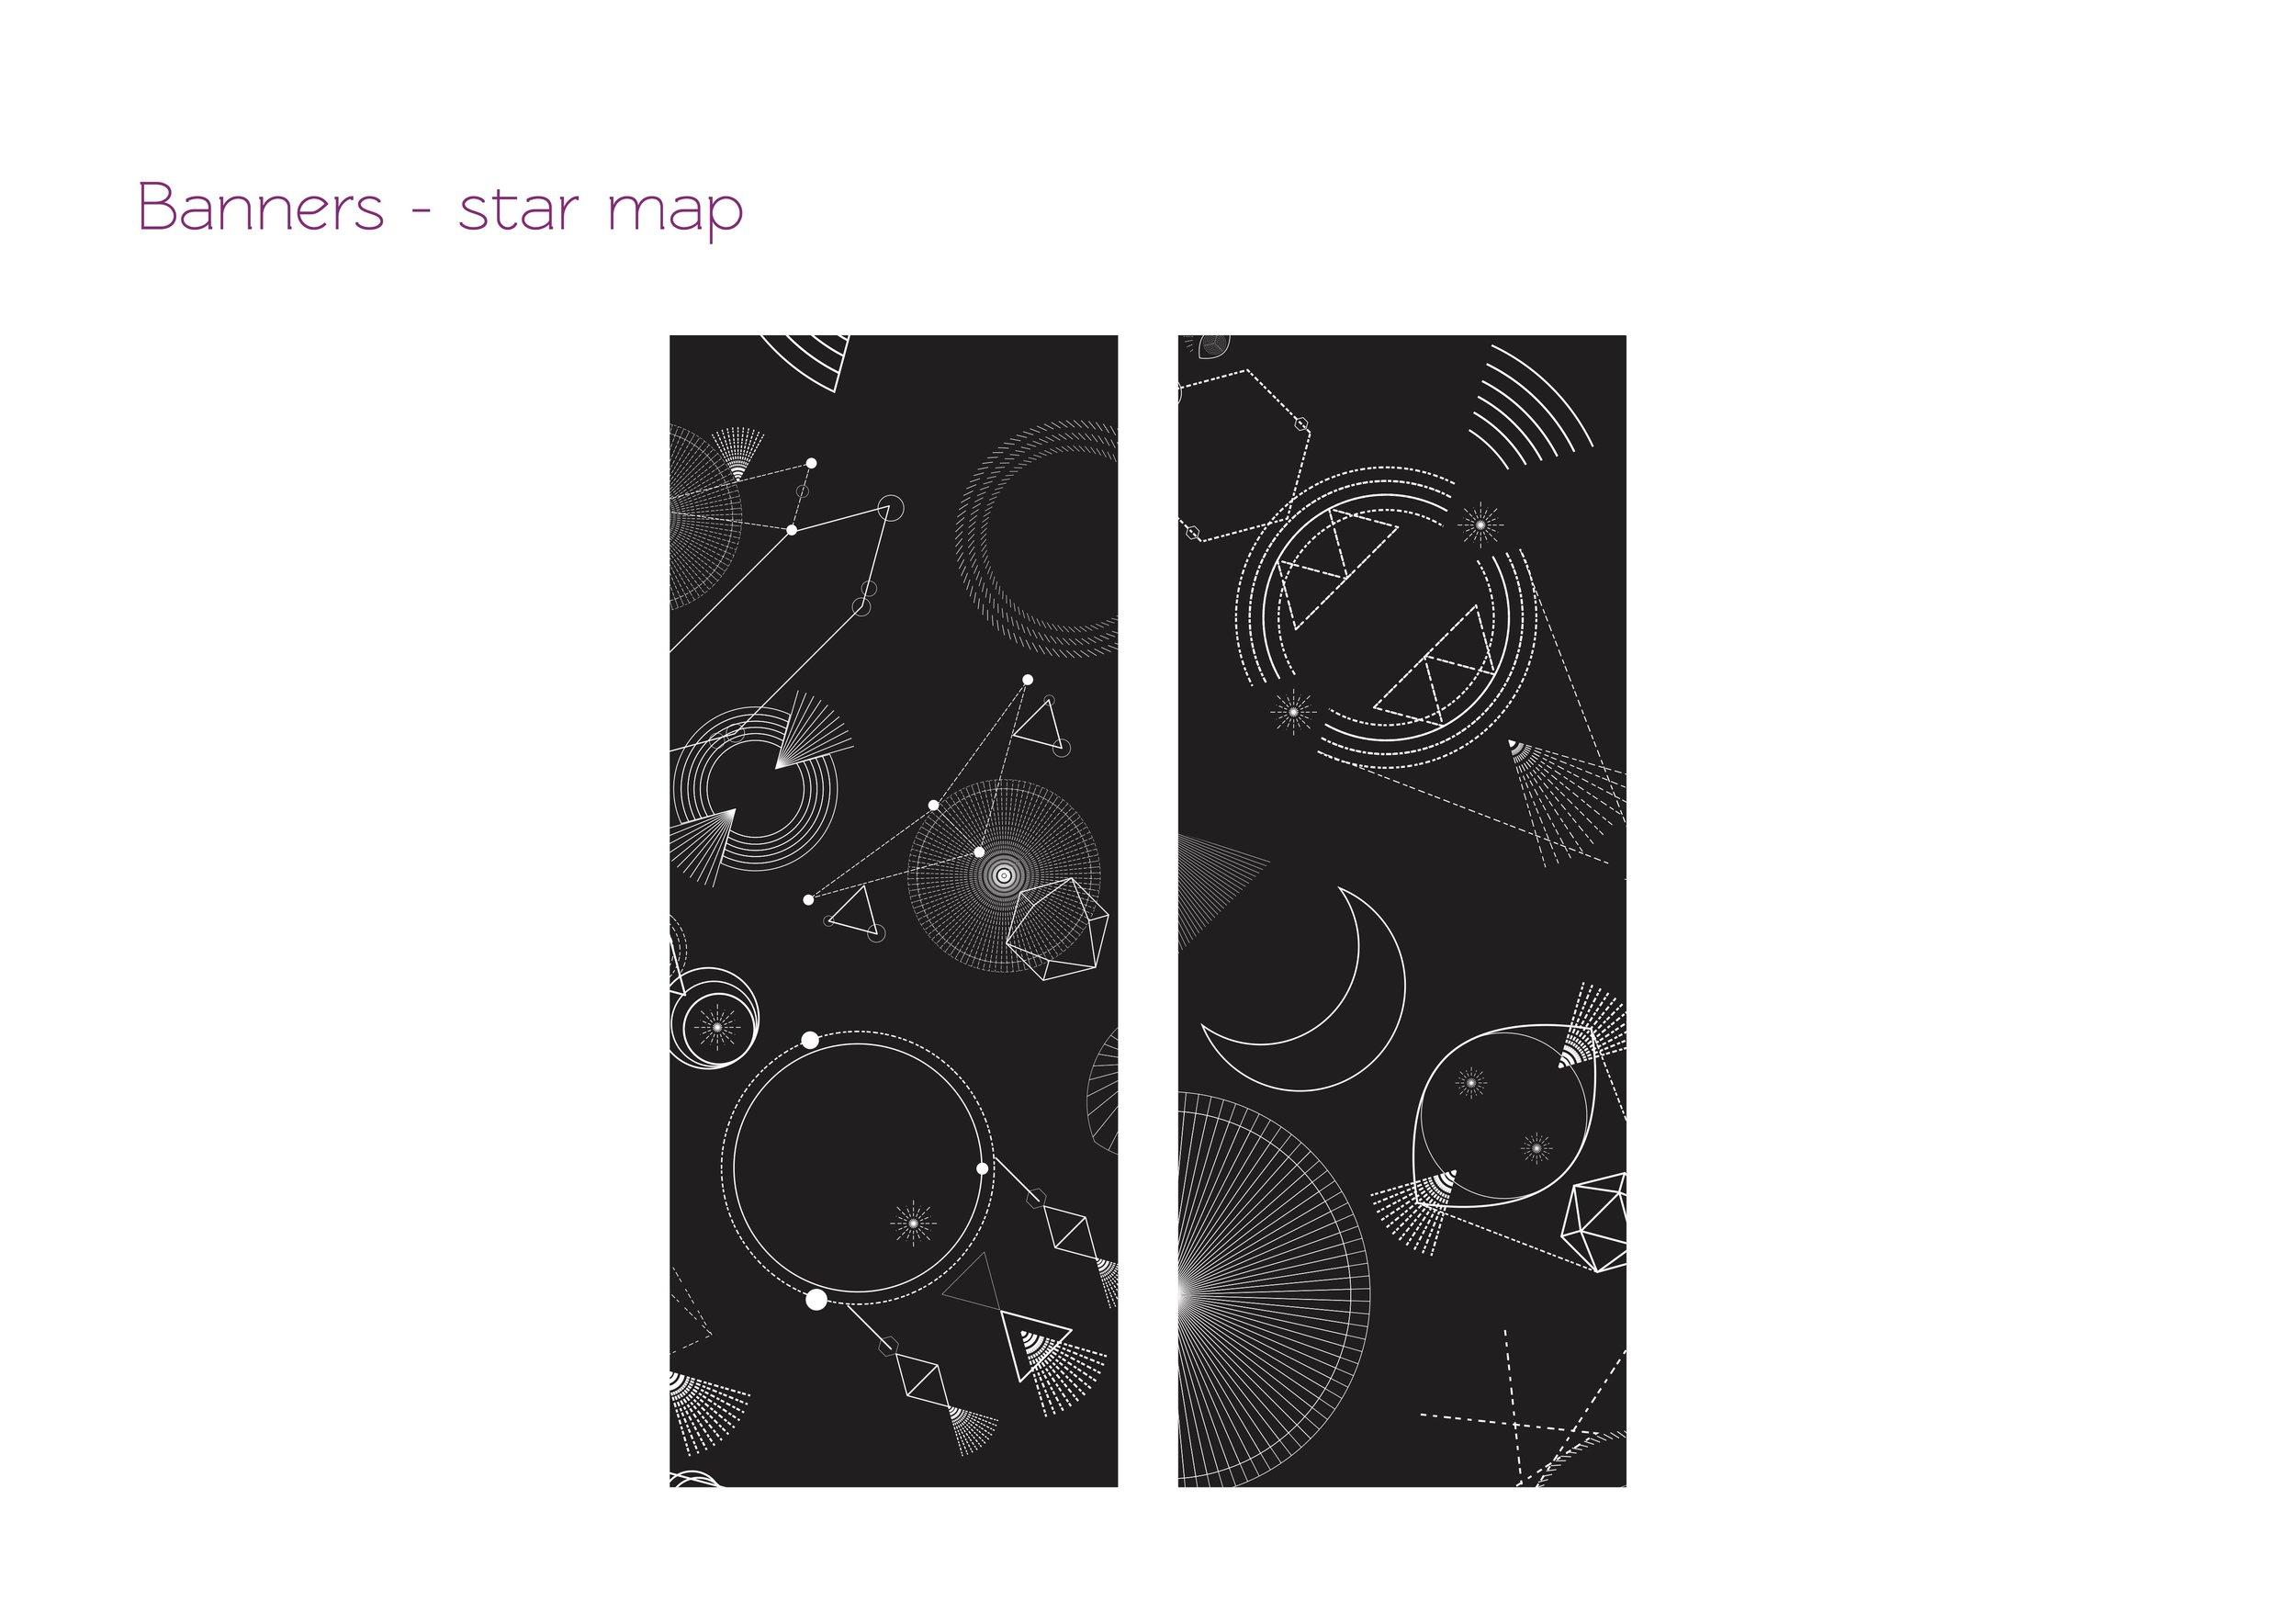 banners star map.jpg